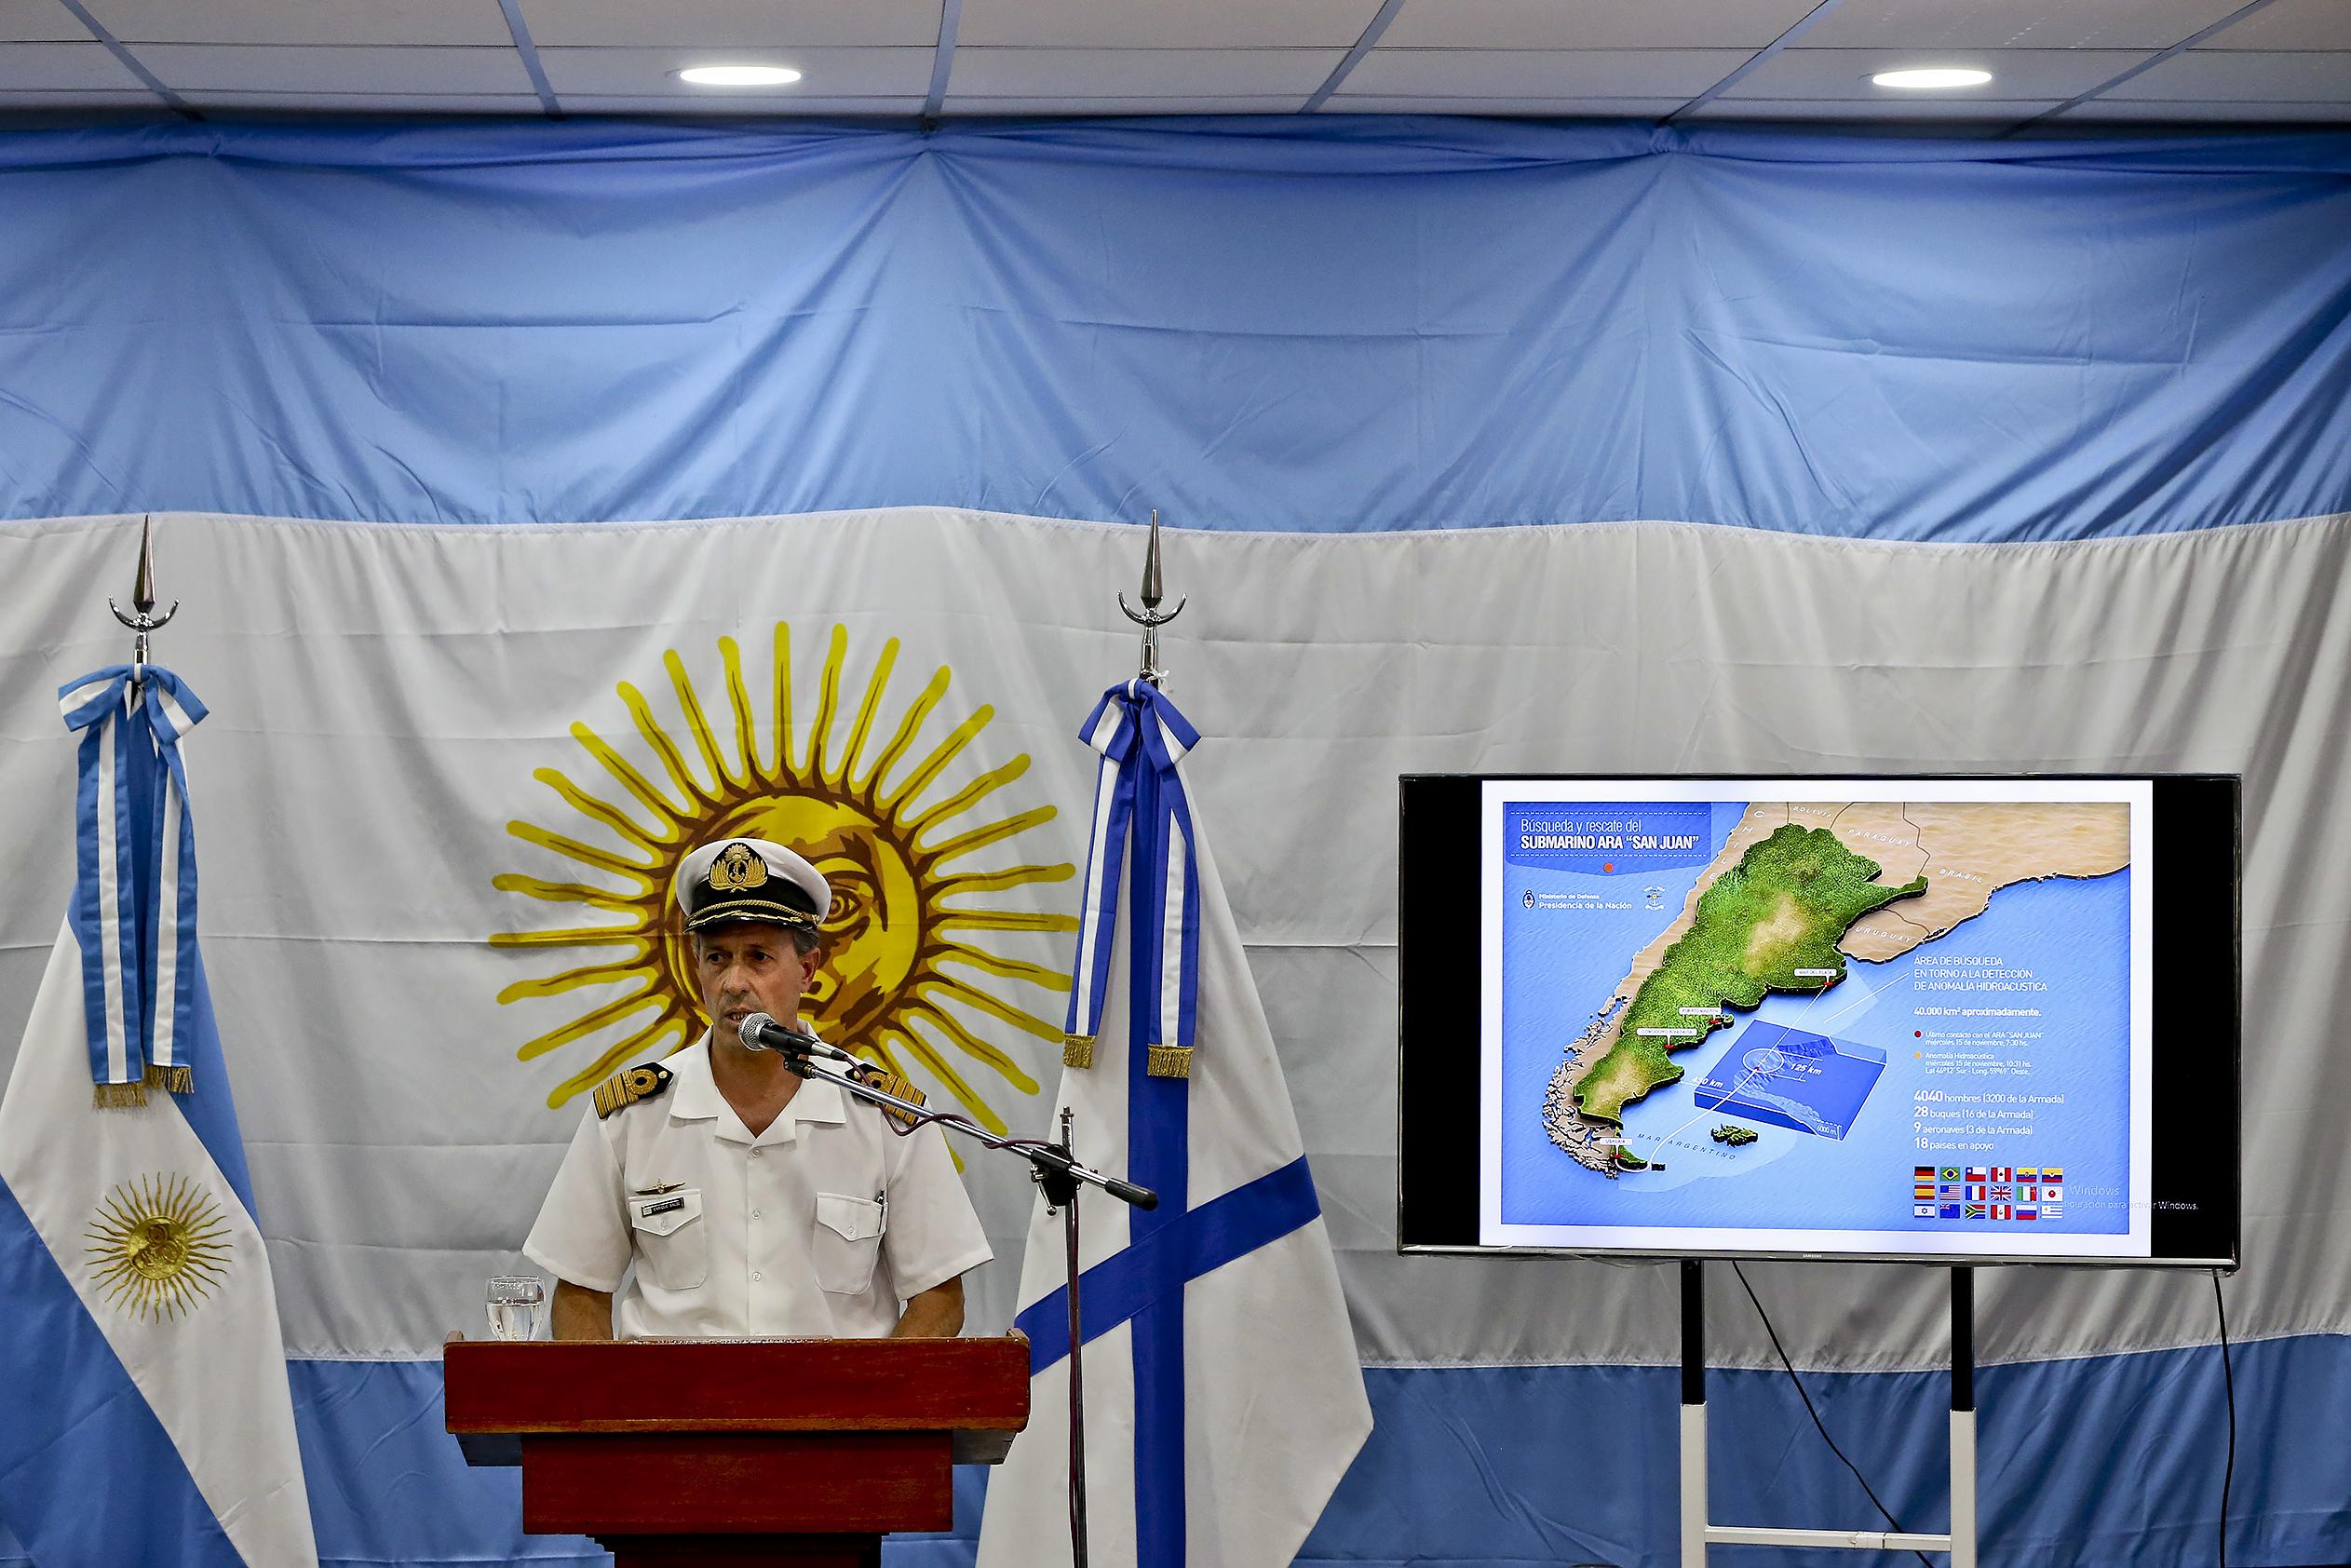 Аргентина признала смерть экипажа подводной лодки «Сан-Хуан»